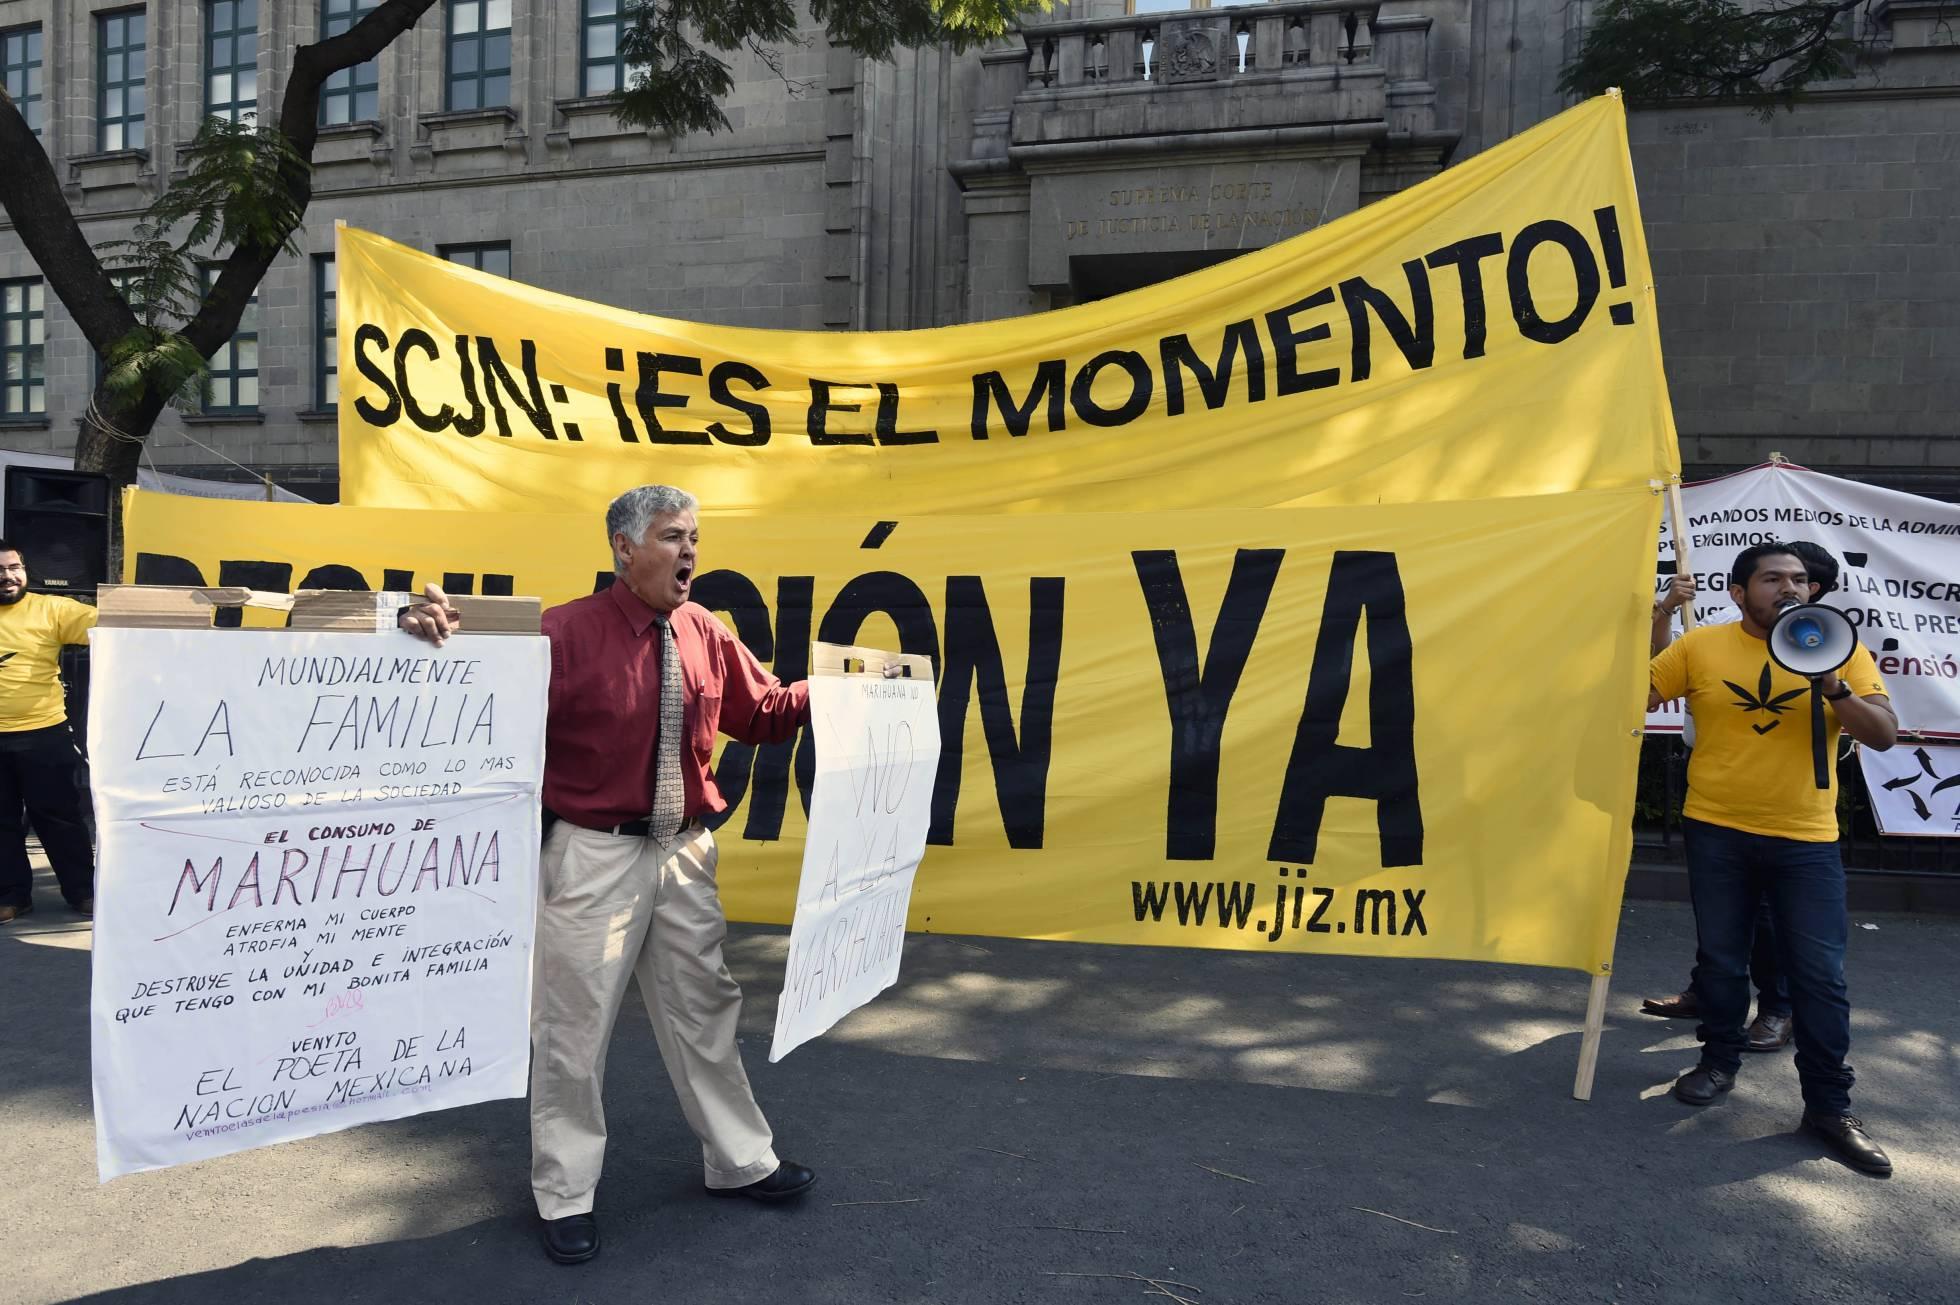 Tres claves del fallo de la Suprema Corte mexicana sobre la marihuana